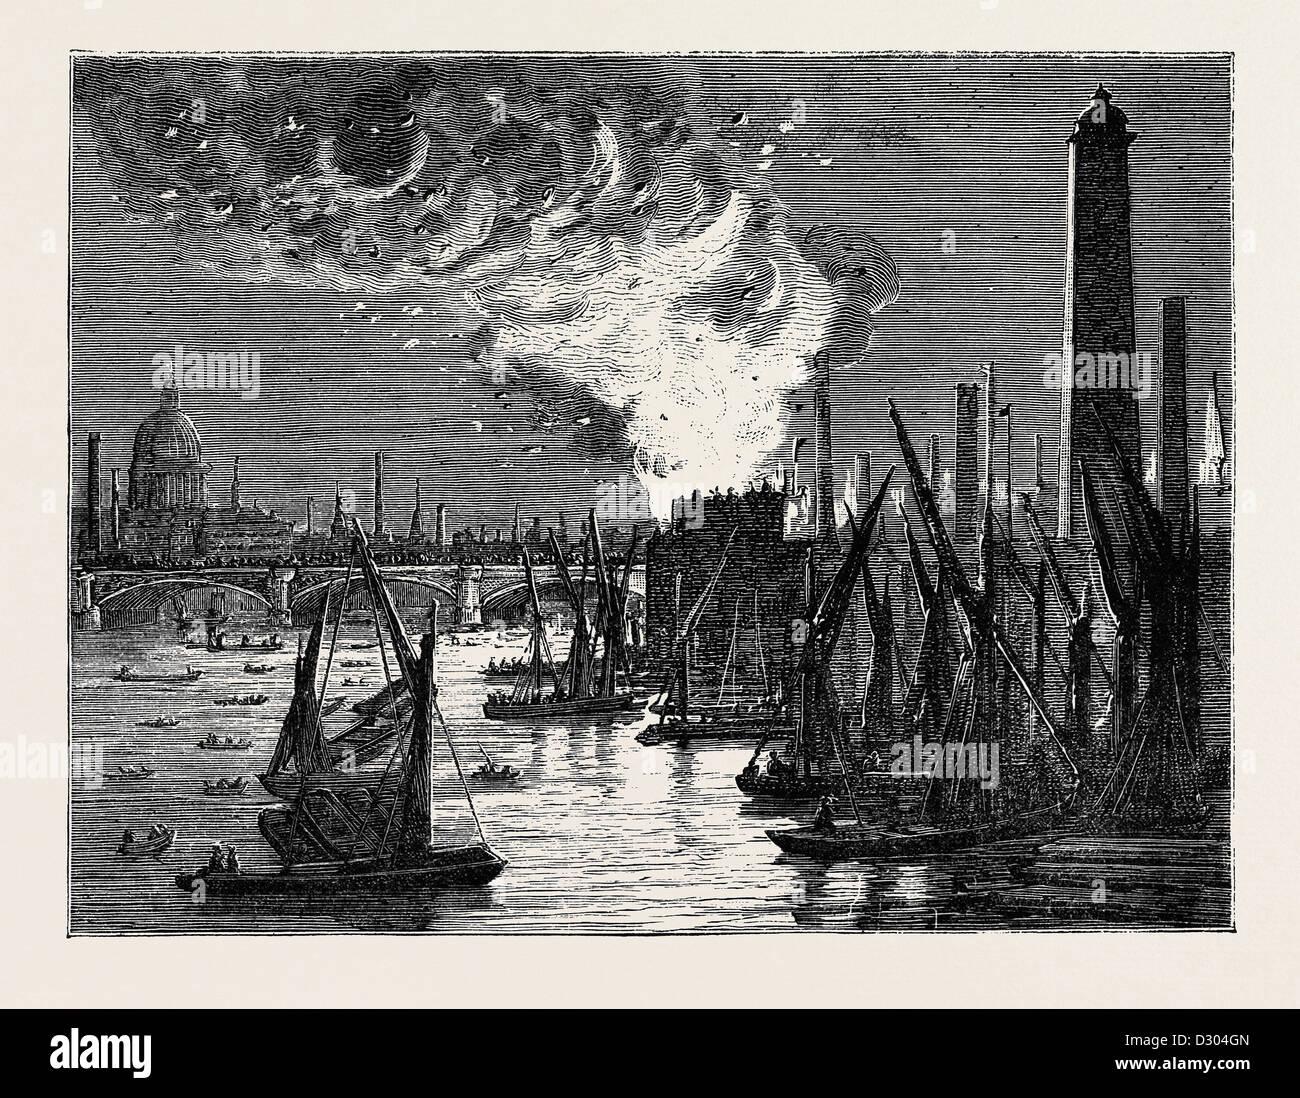 FIRE AT BLACKFRIARS BRIDGE ON NEW YEAR'S EVE, LONDON, 1870 - Stock Image